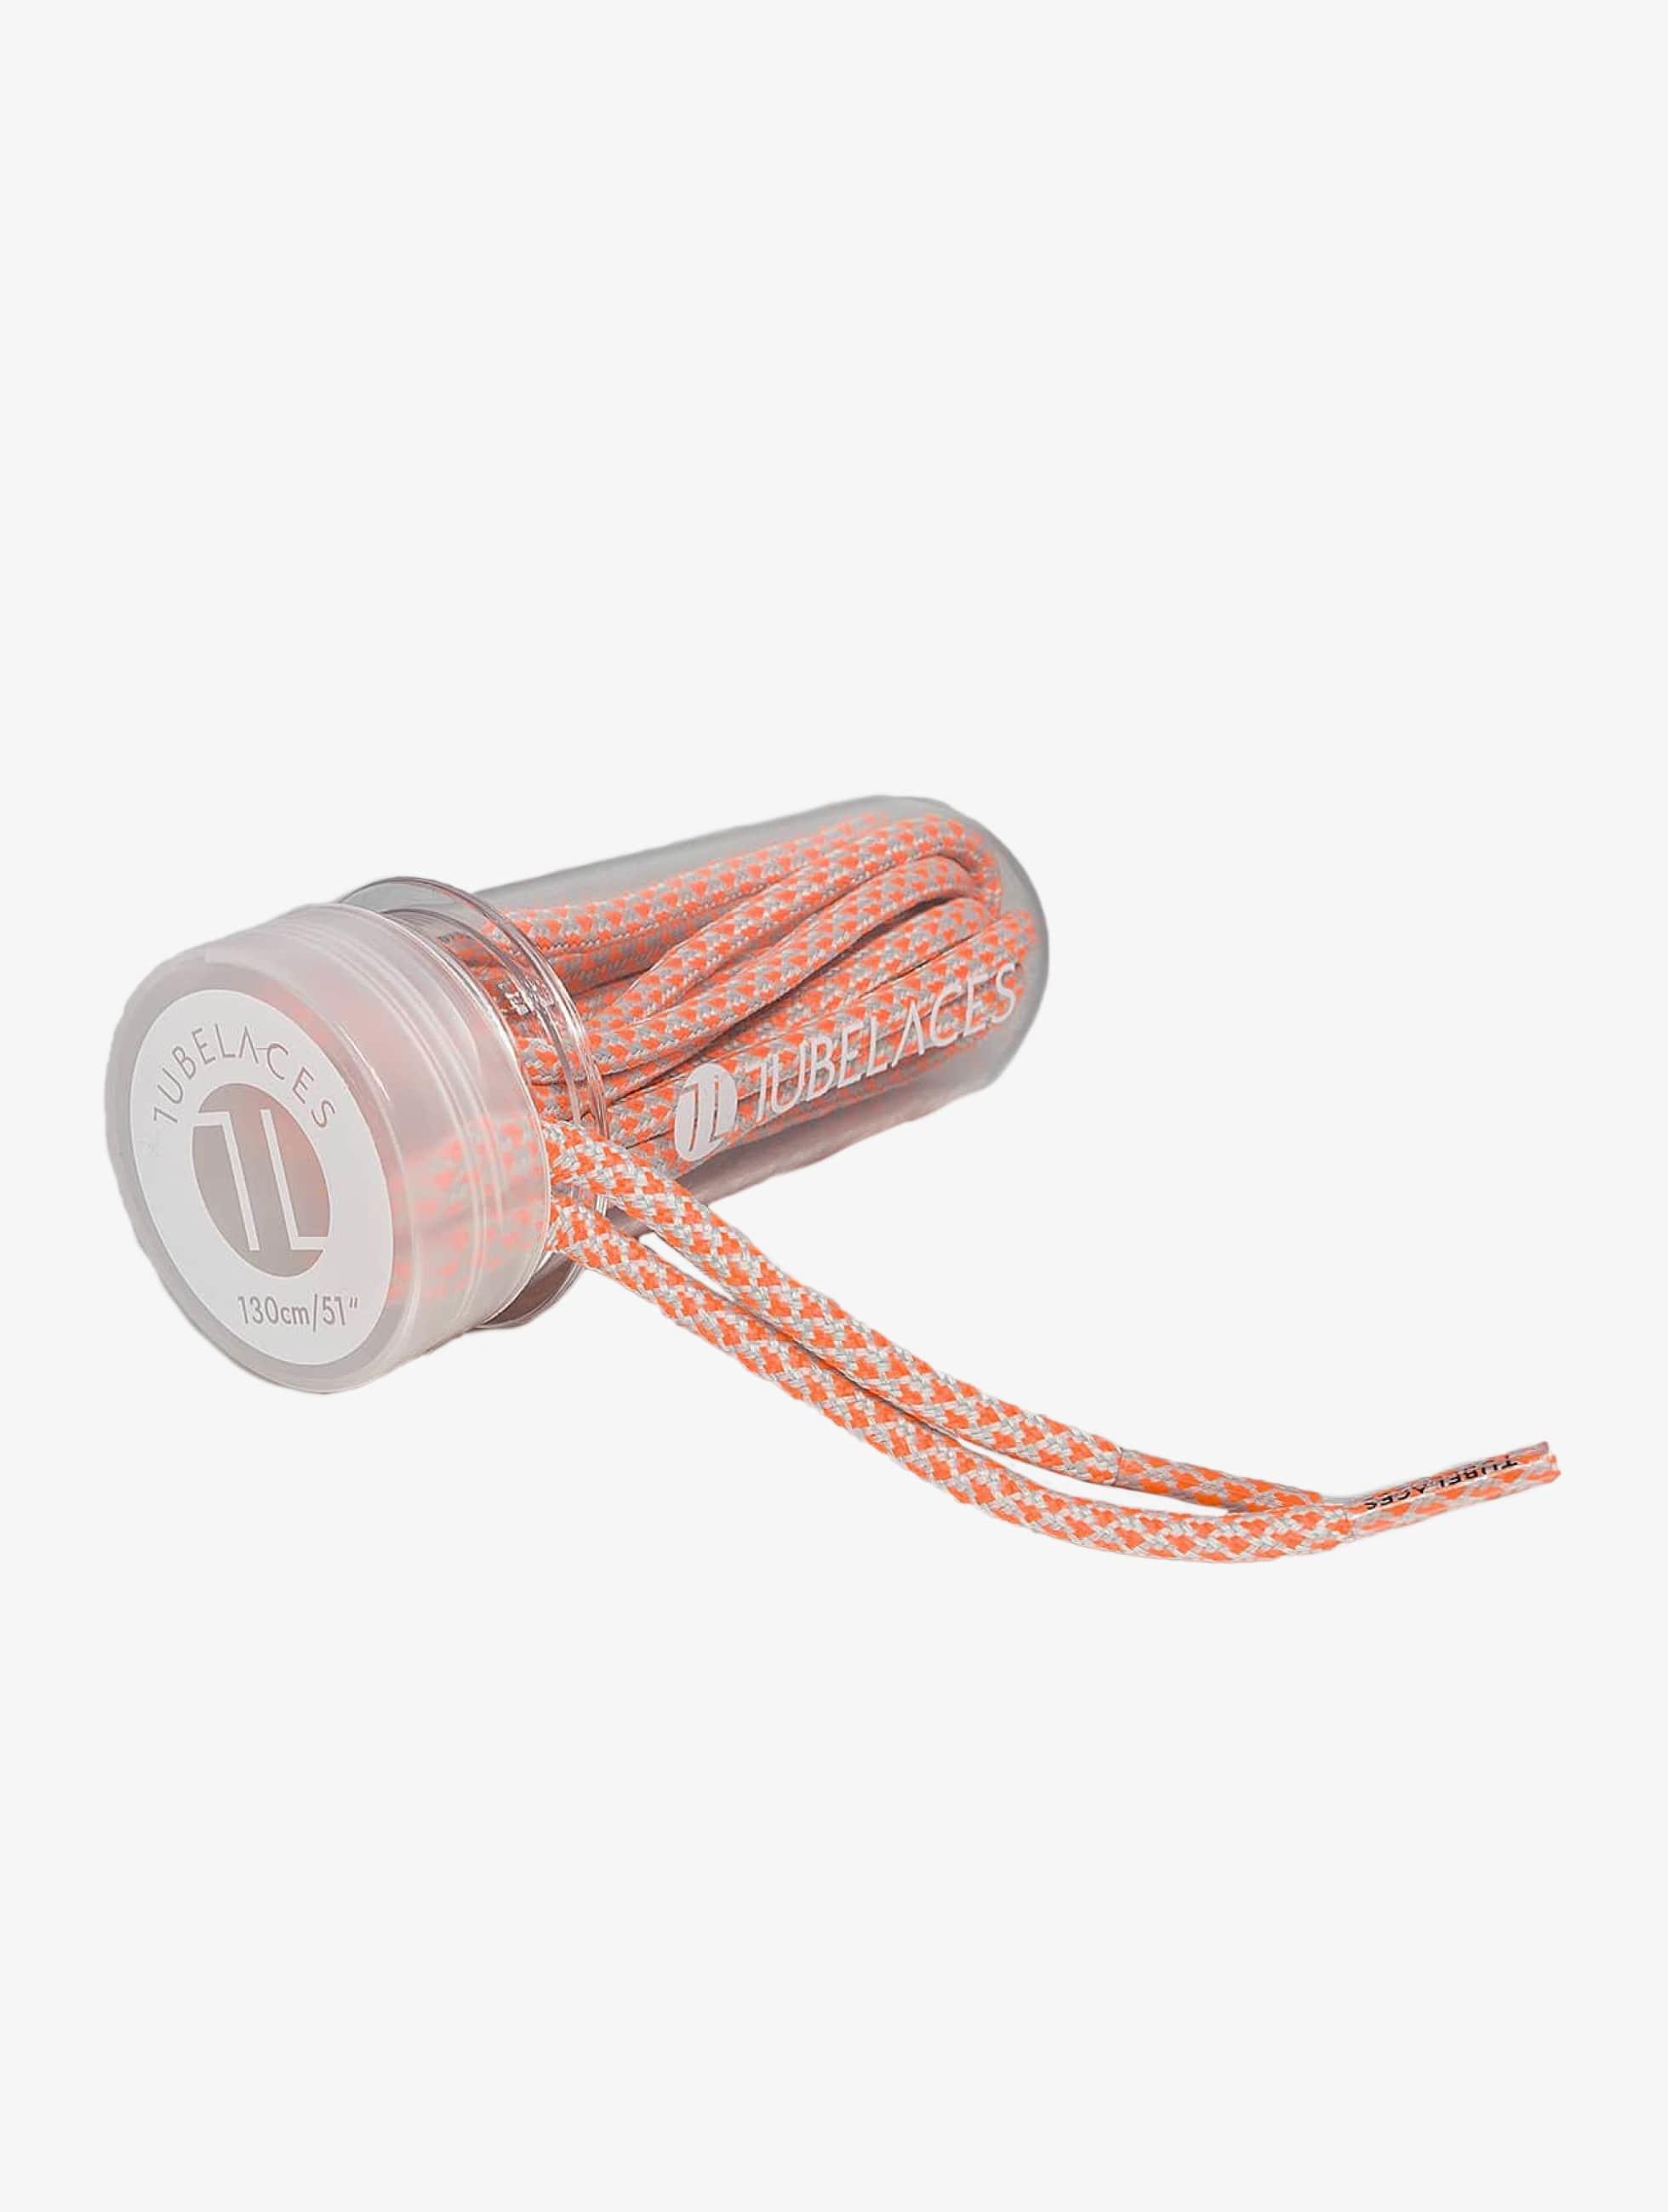 Tubelaces Аксессуар для обуви Rope Multi оранжевый